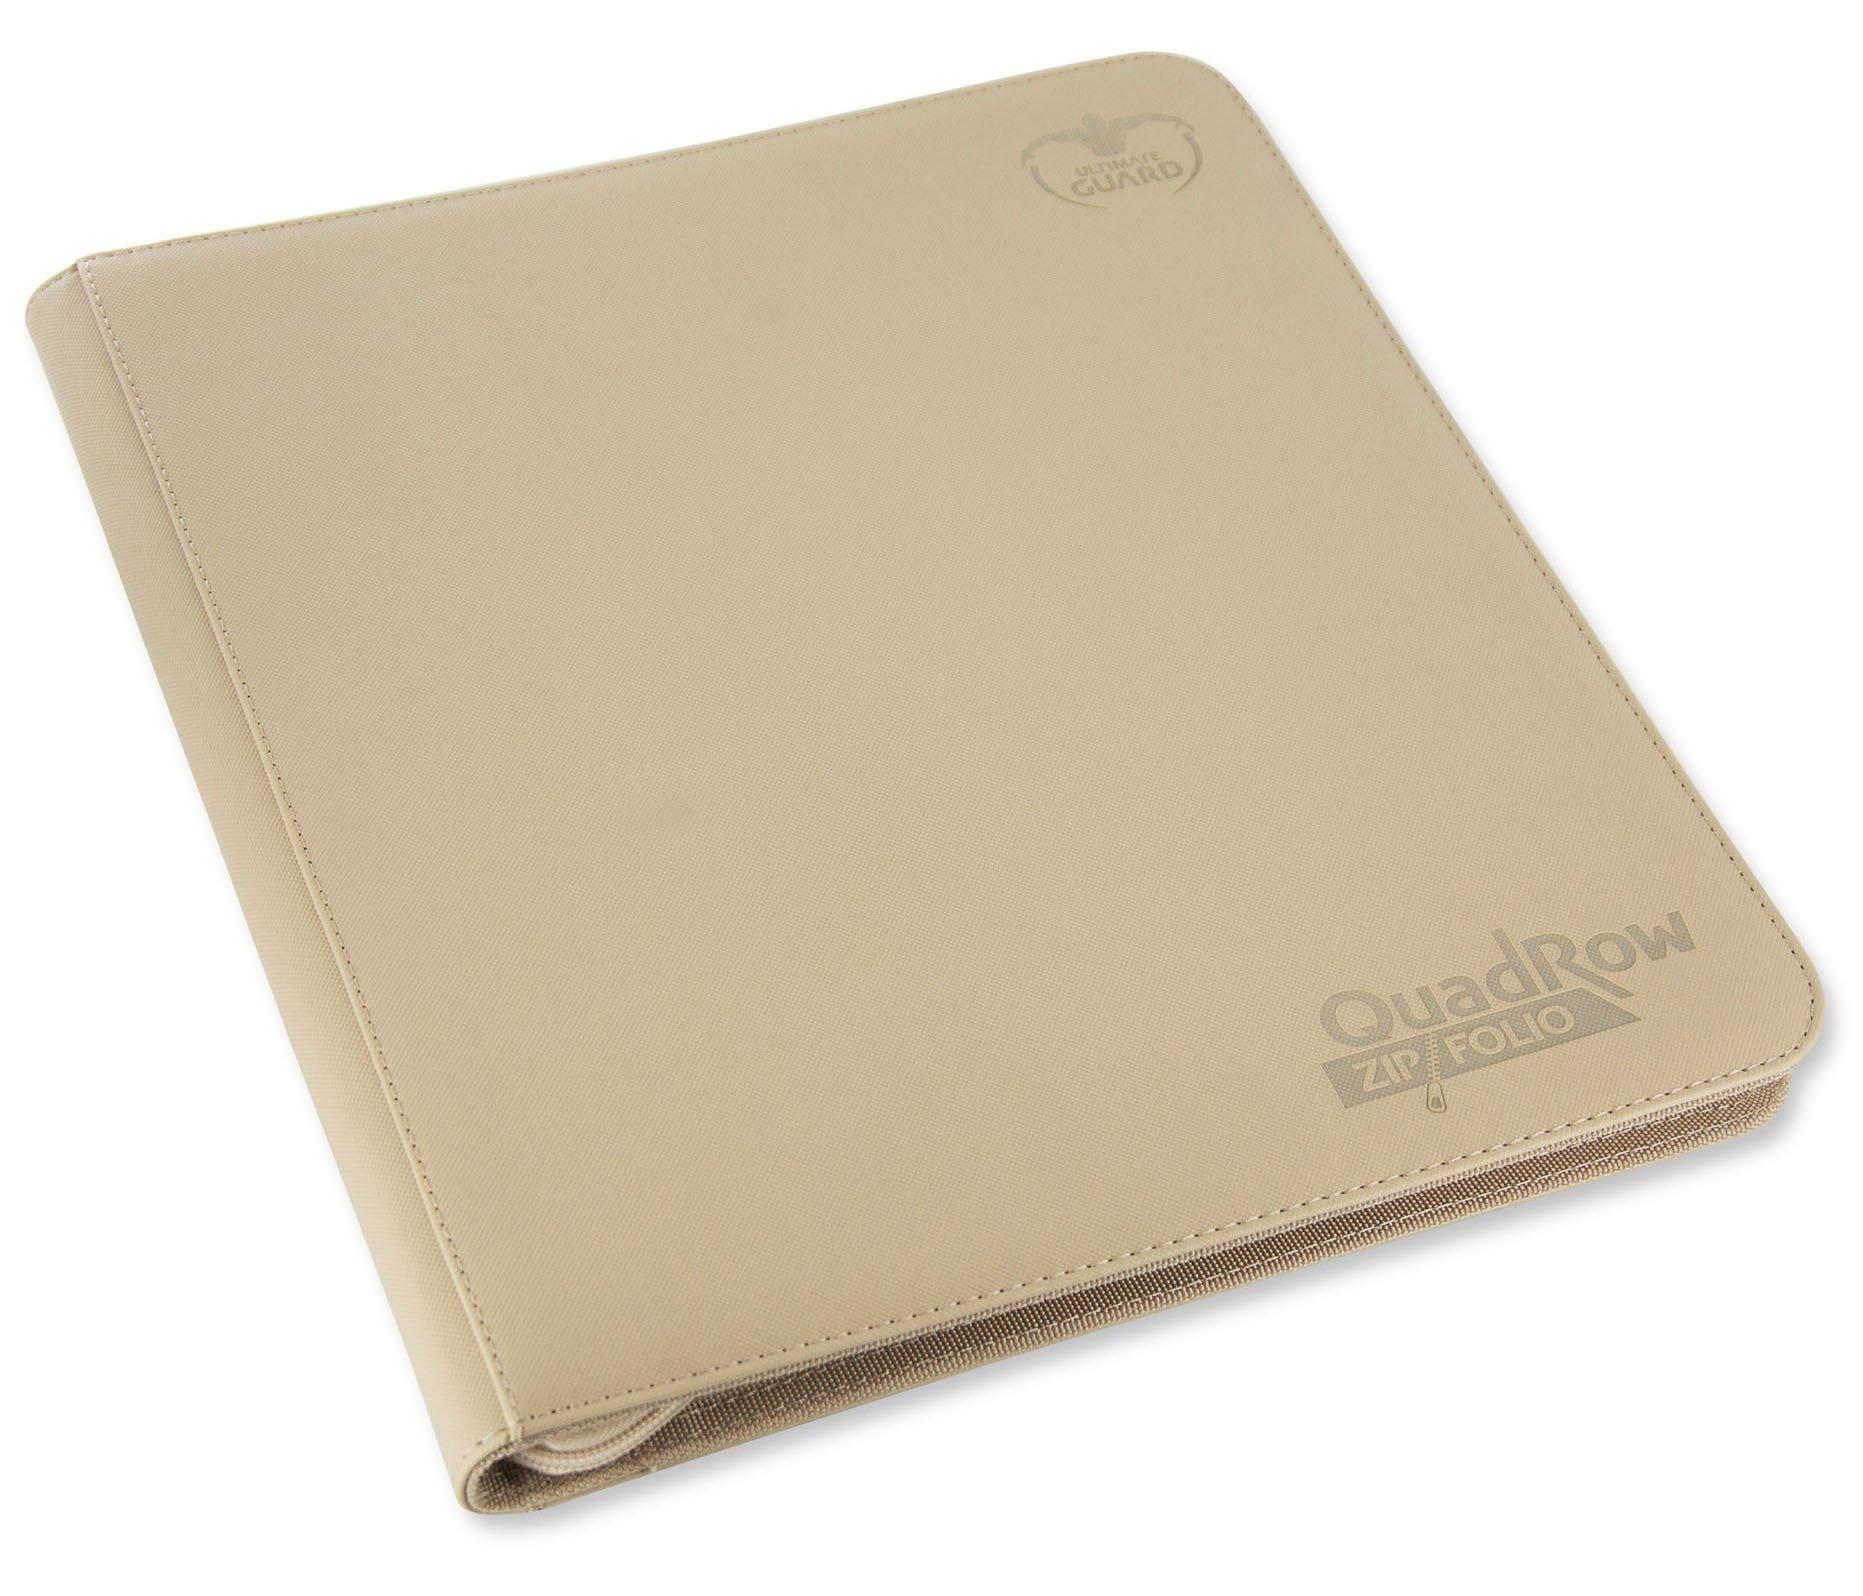 Ultimate Guard Quadrow Zipfolio Xenoskin Sand Cards